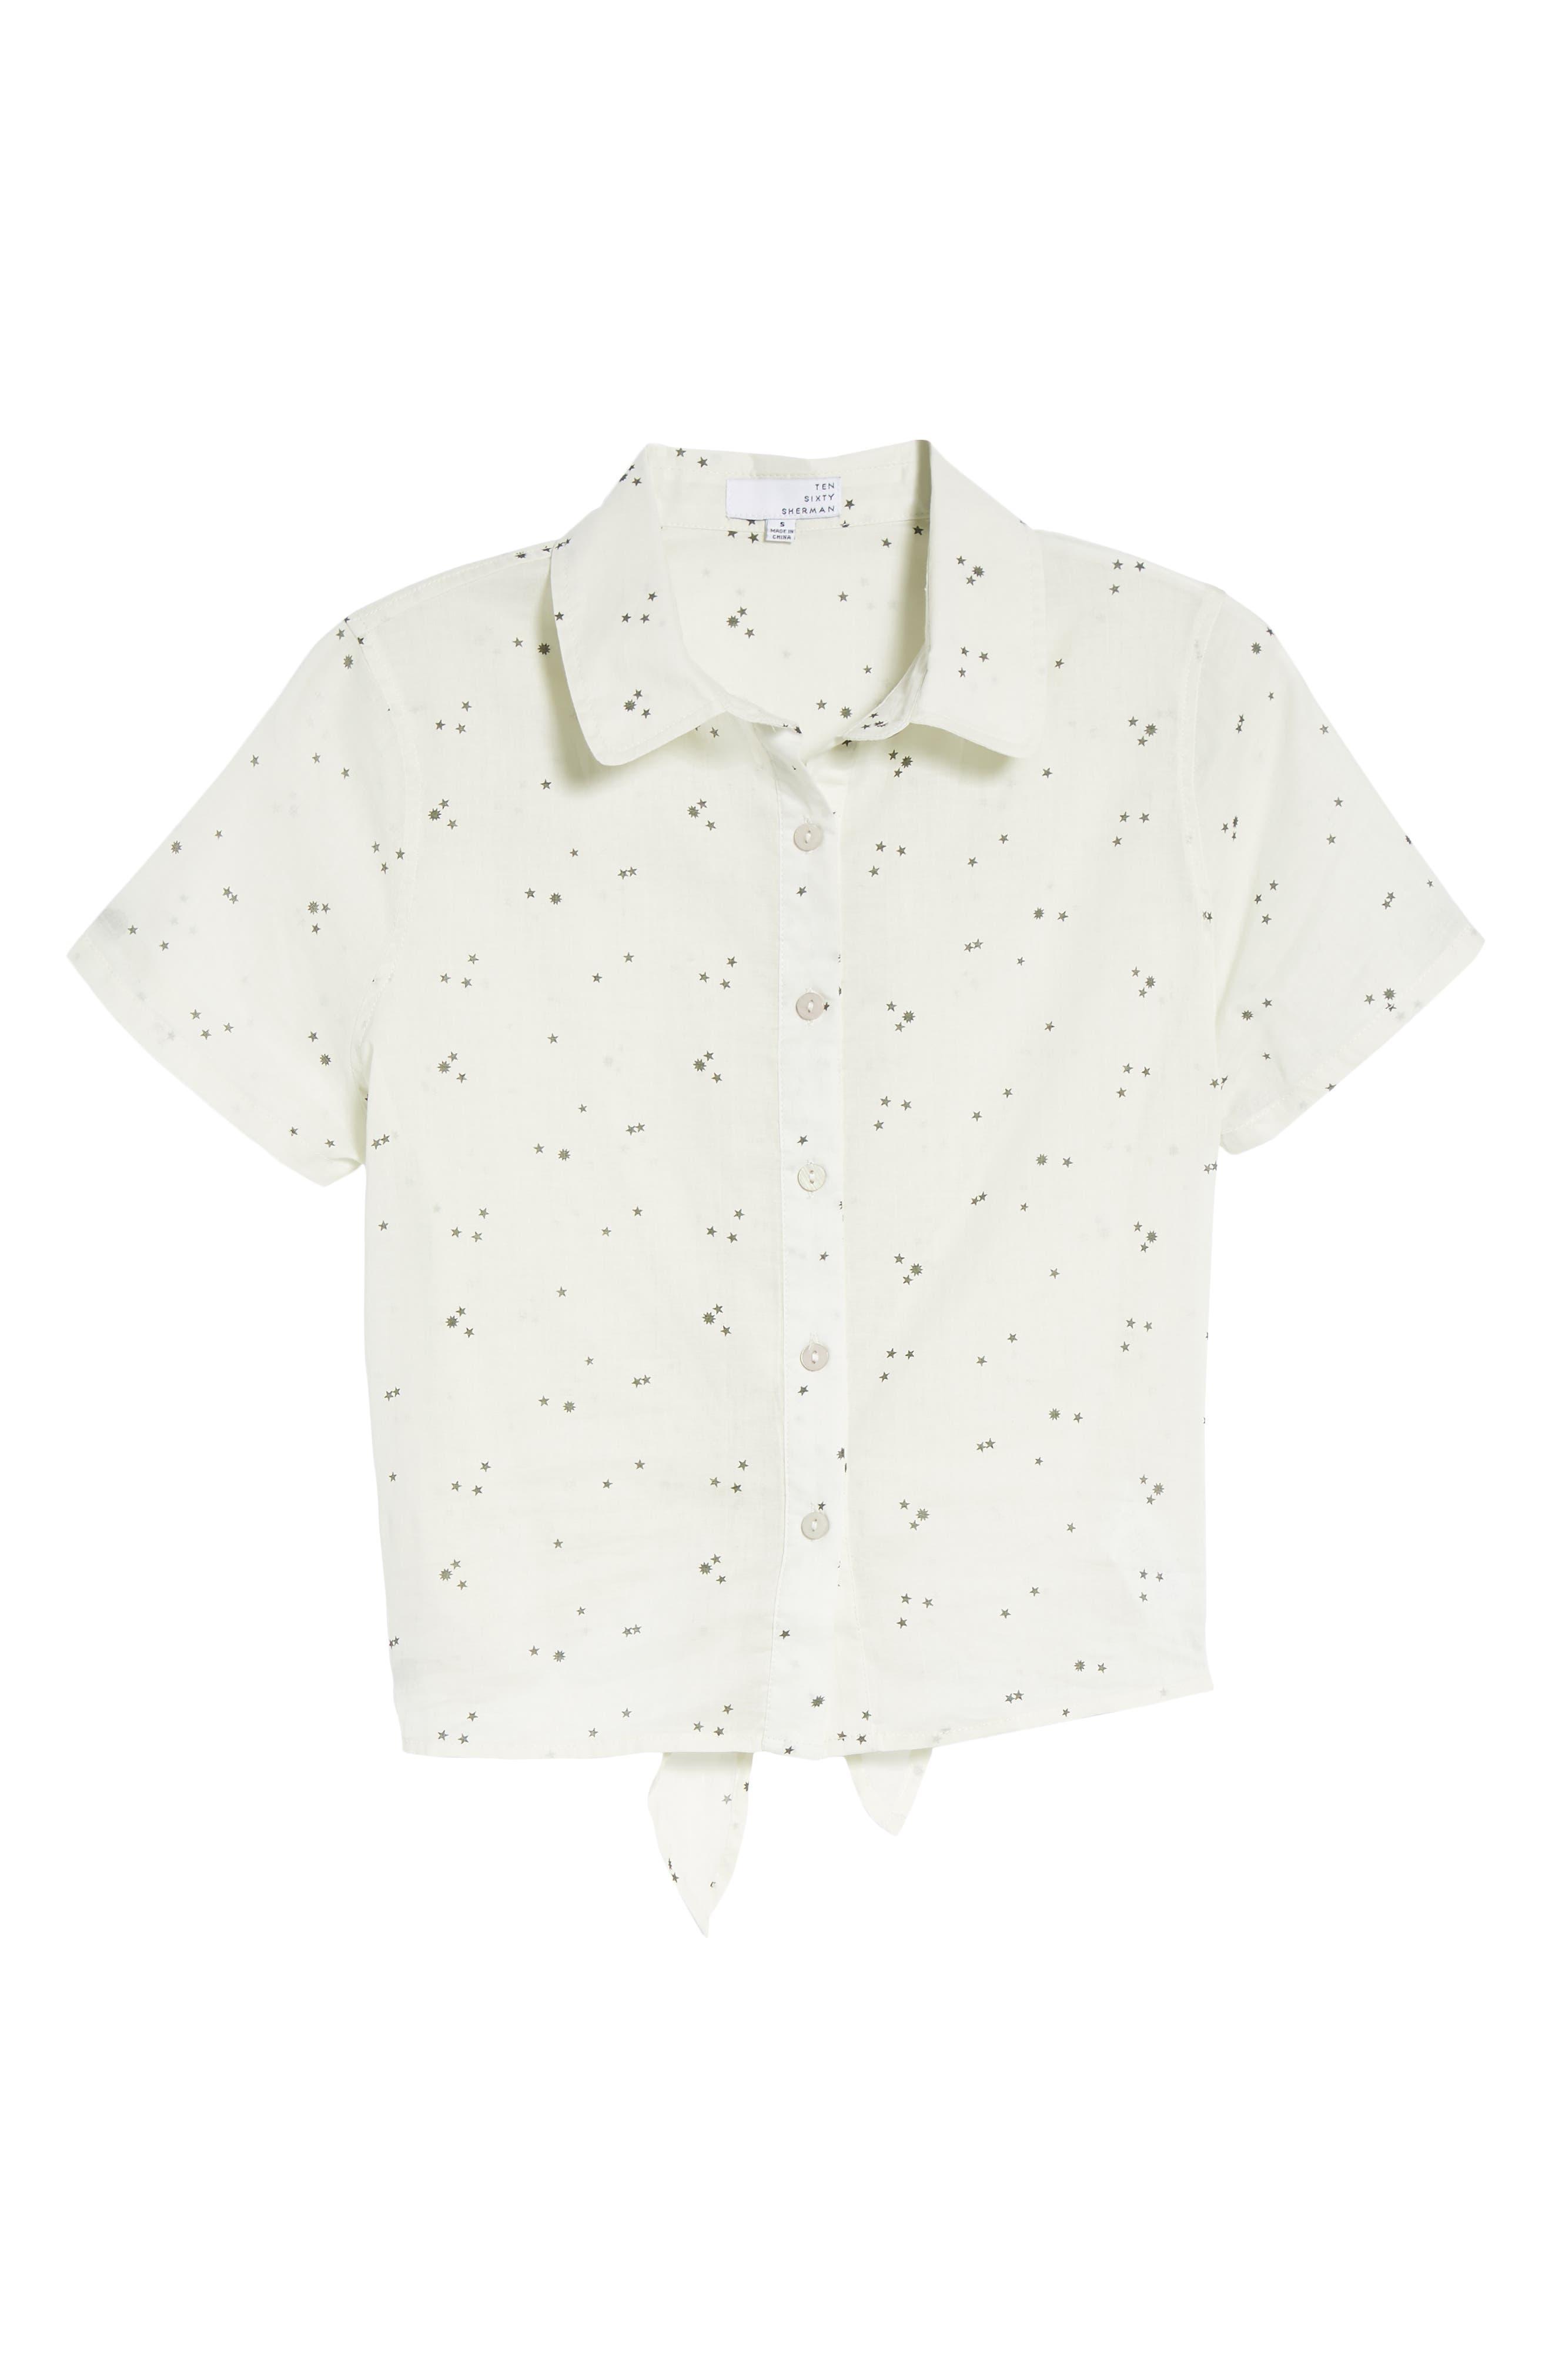 Tie Back Camp Shirt,                             Alternate thumbnail 7, color,                             White Star Print